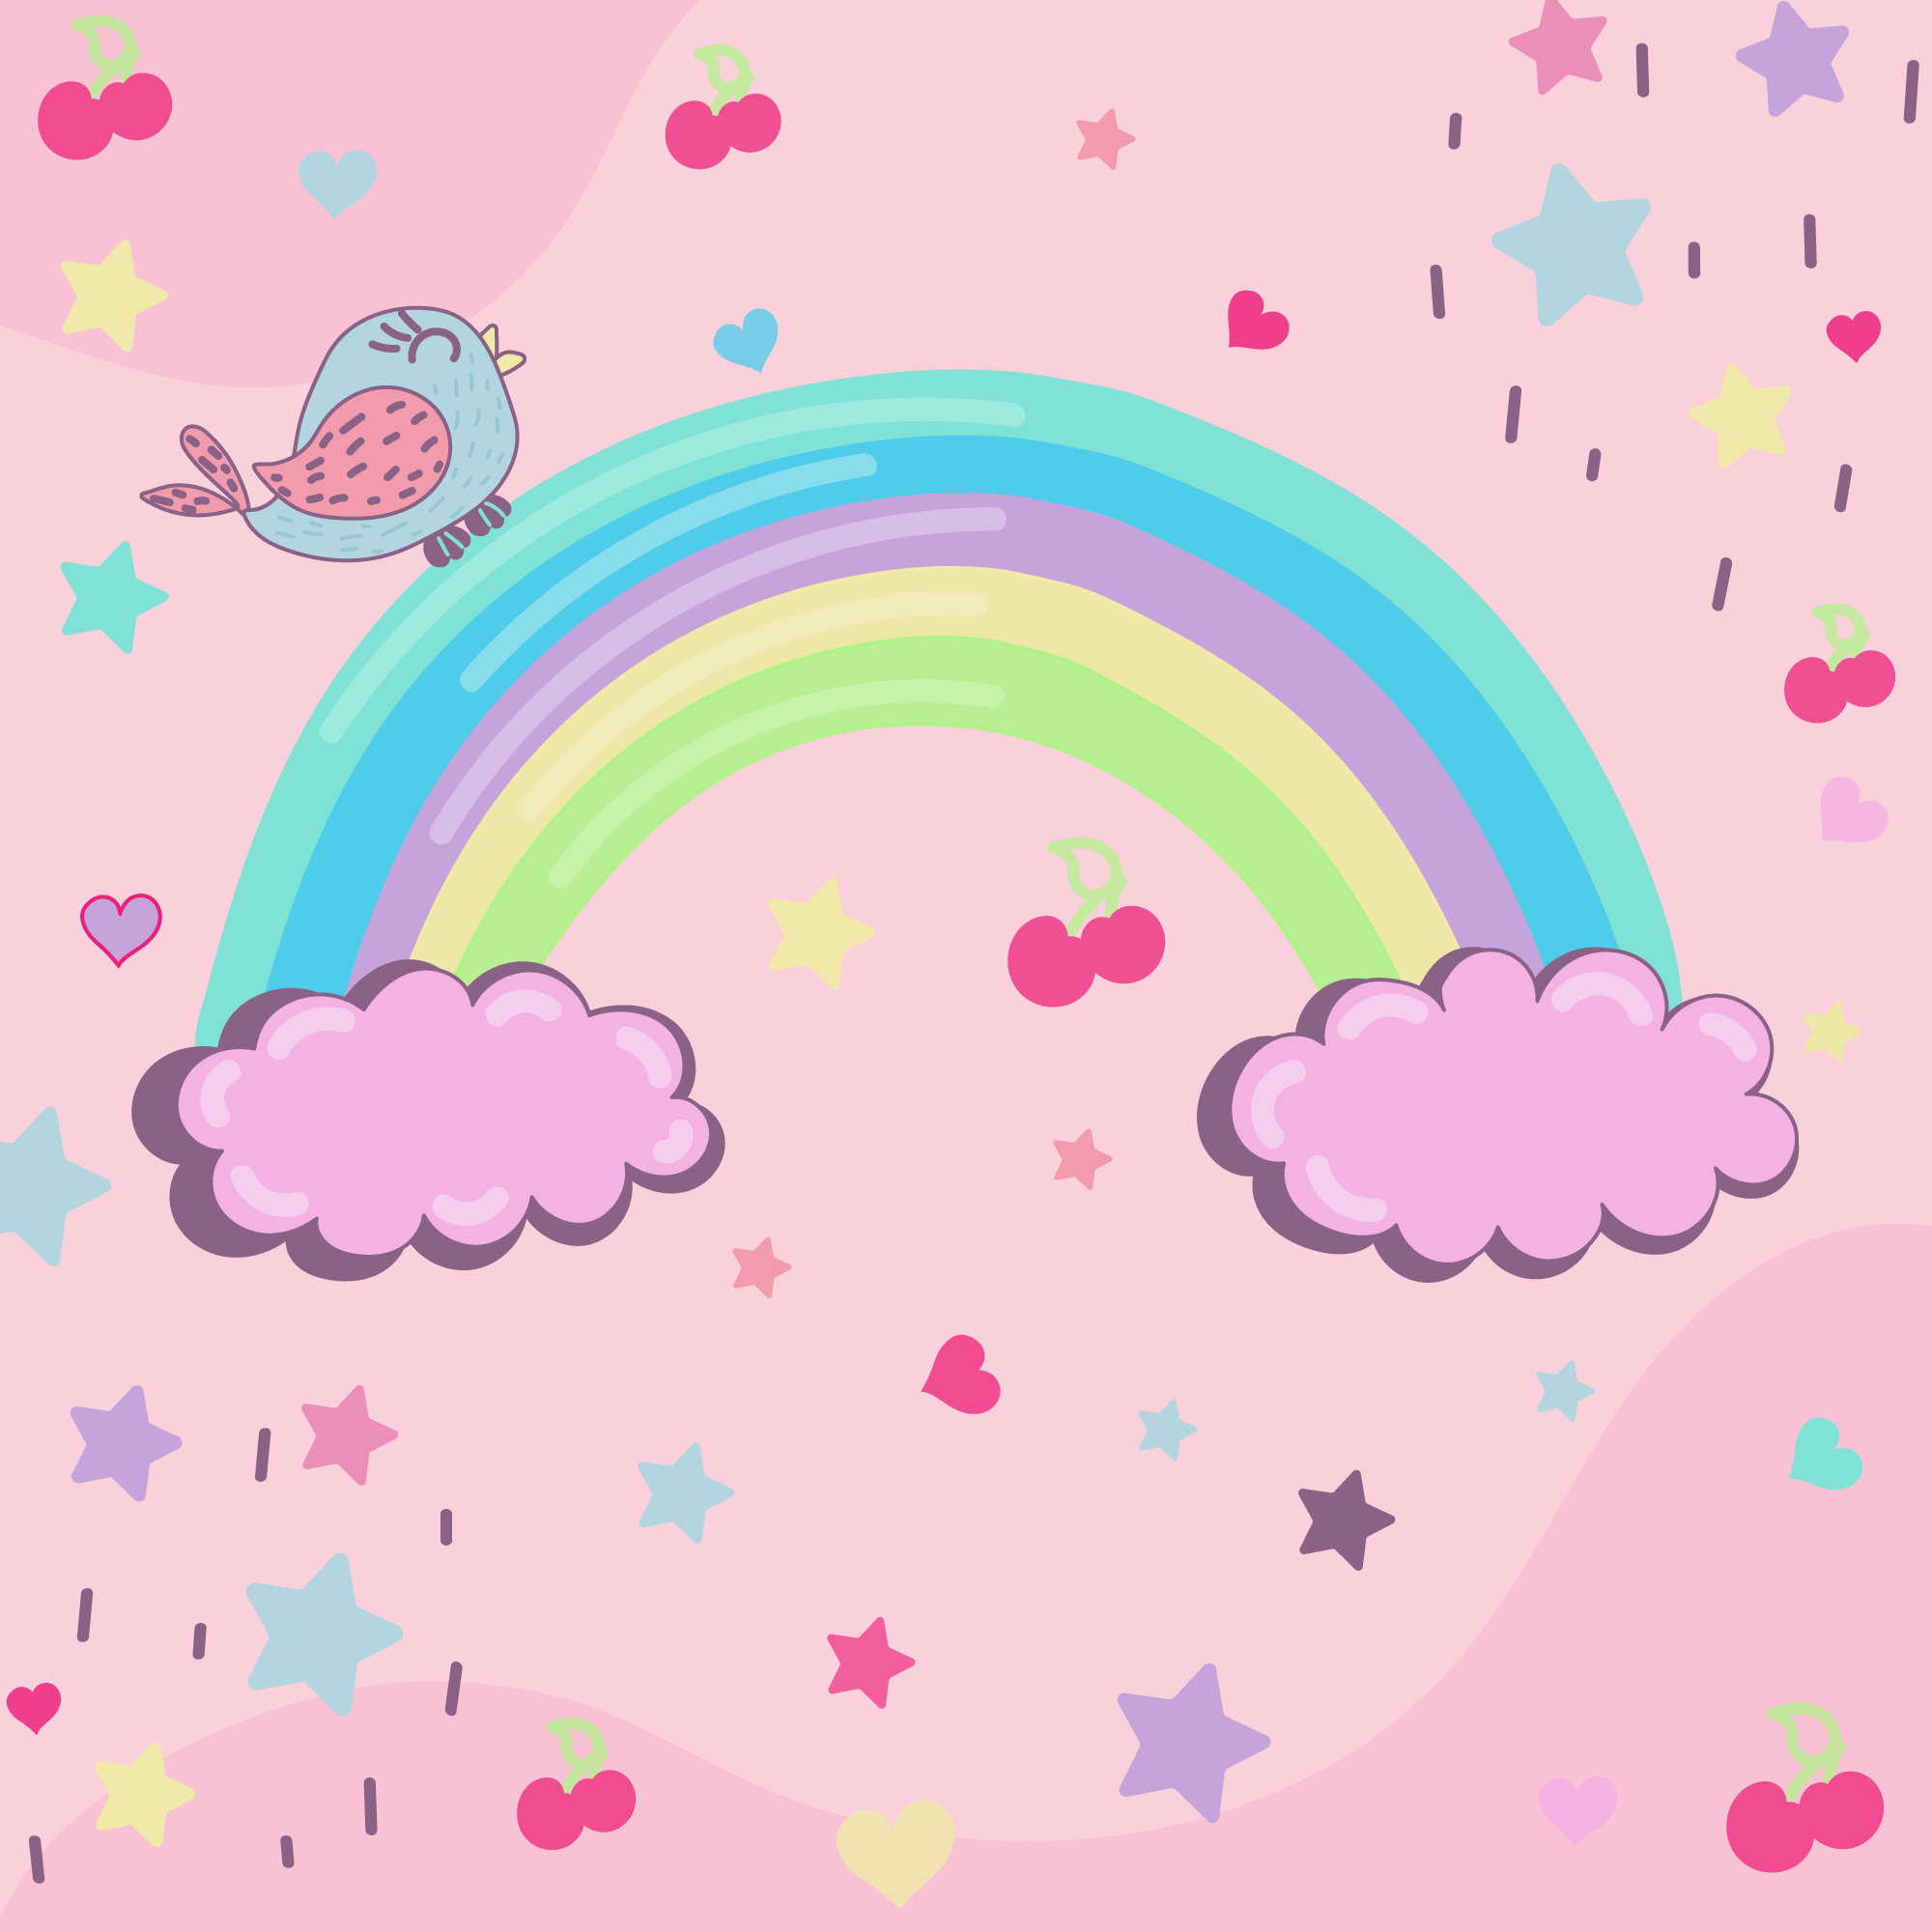 Rainbow Doodle Free Vector Art